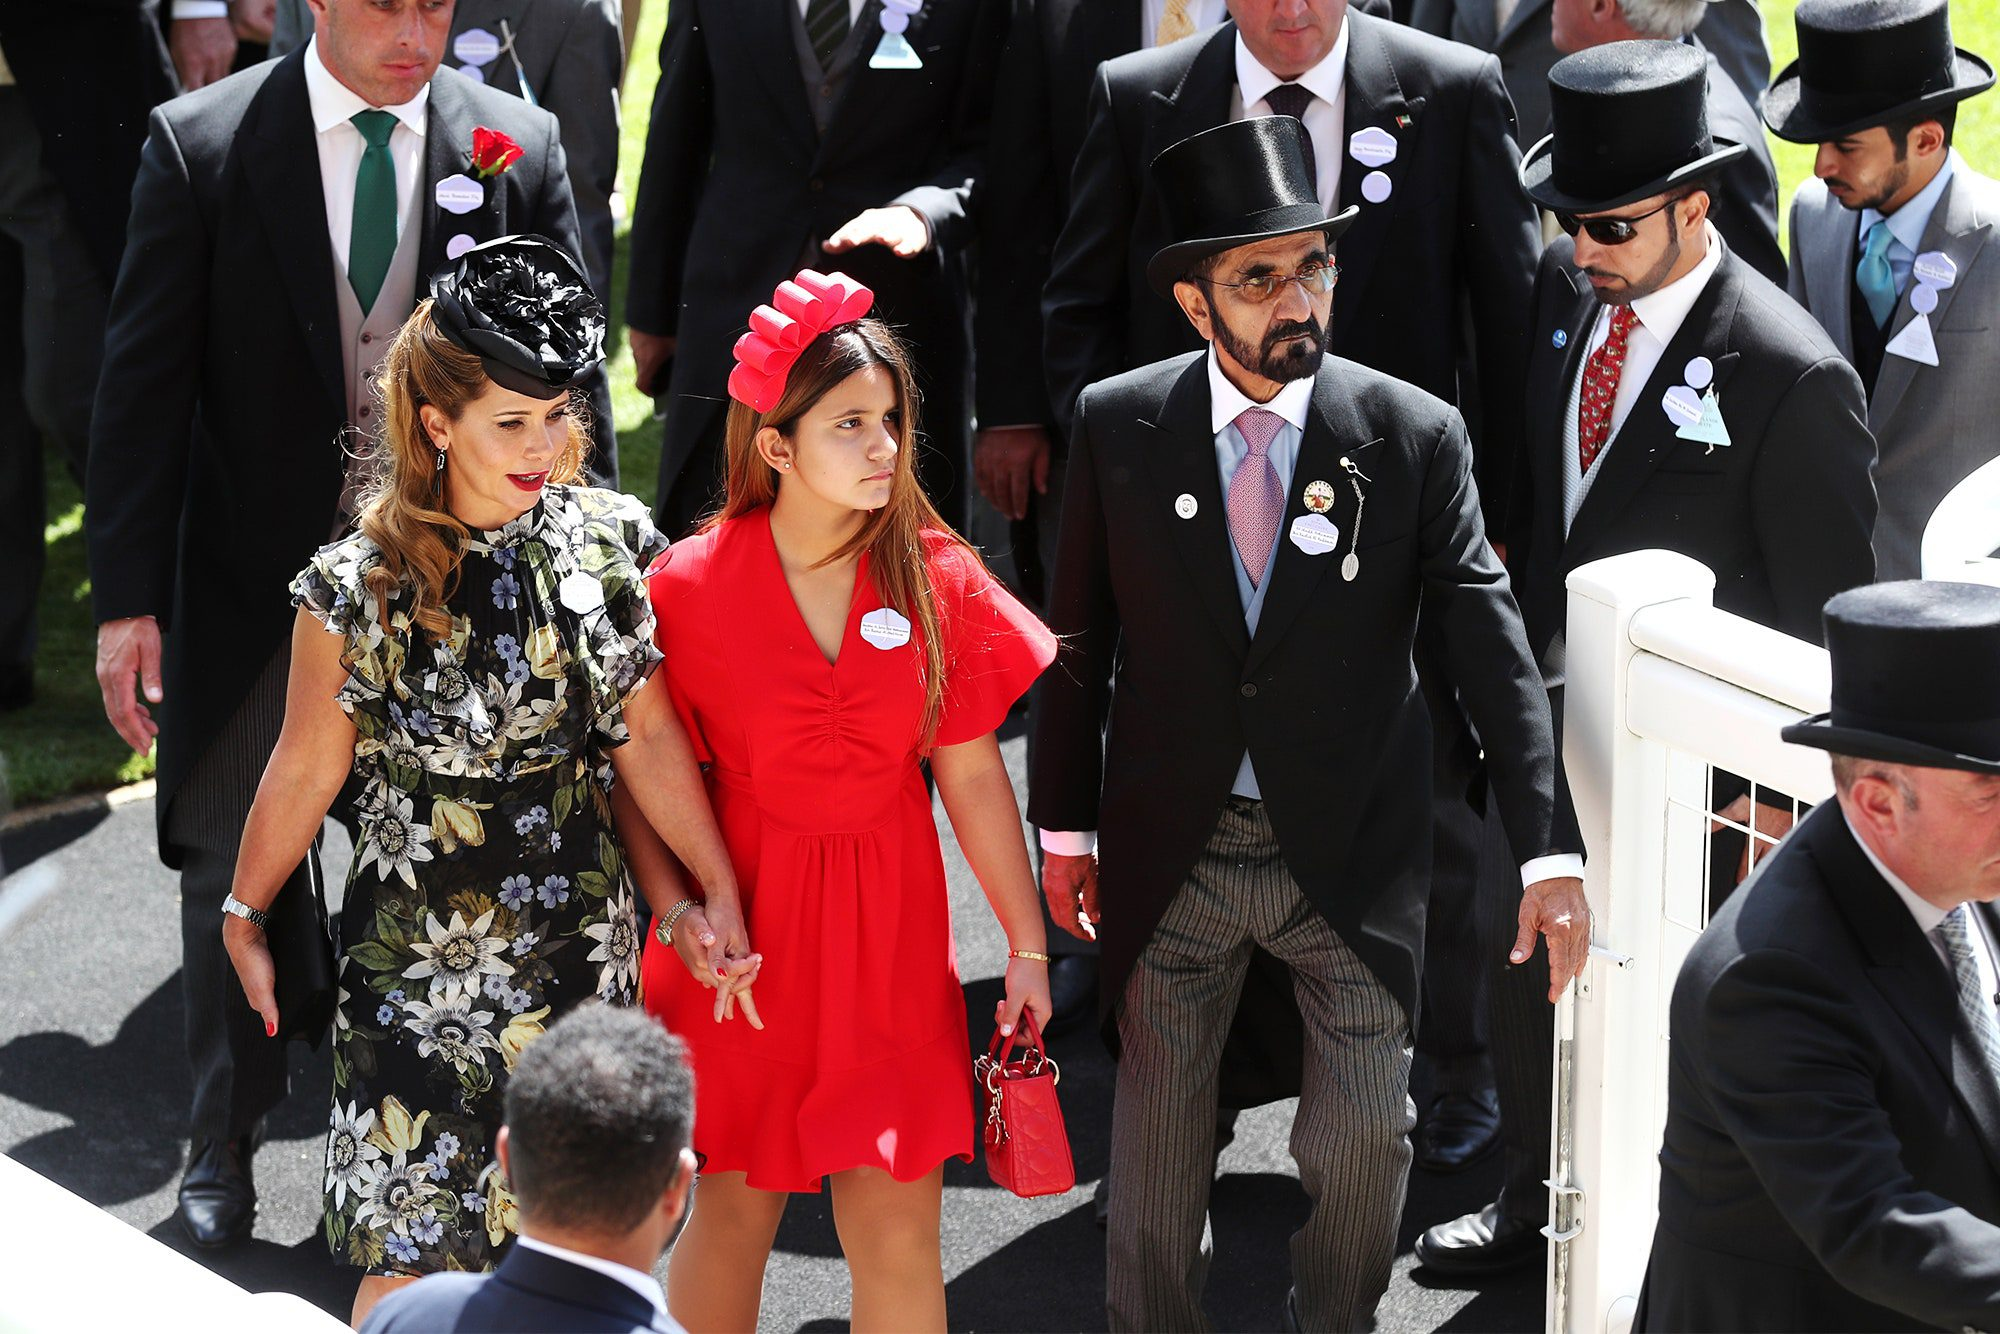 Princess Haya with daughter and husband